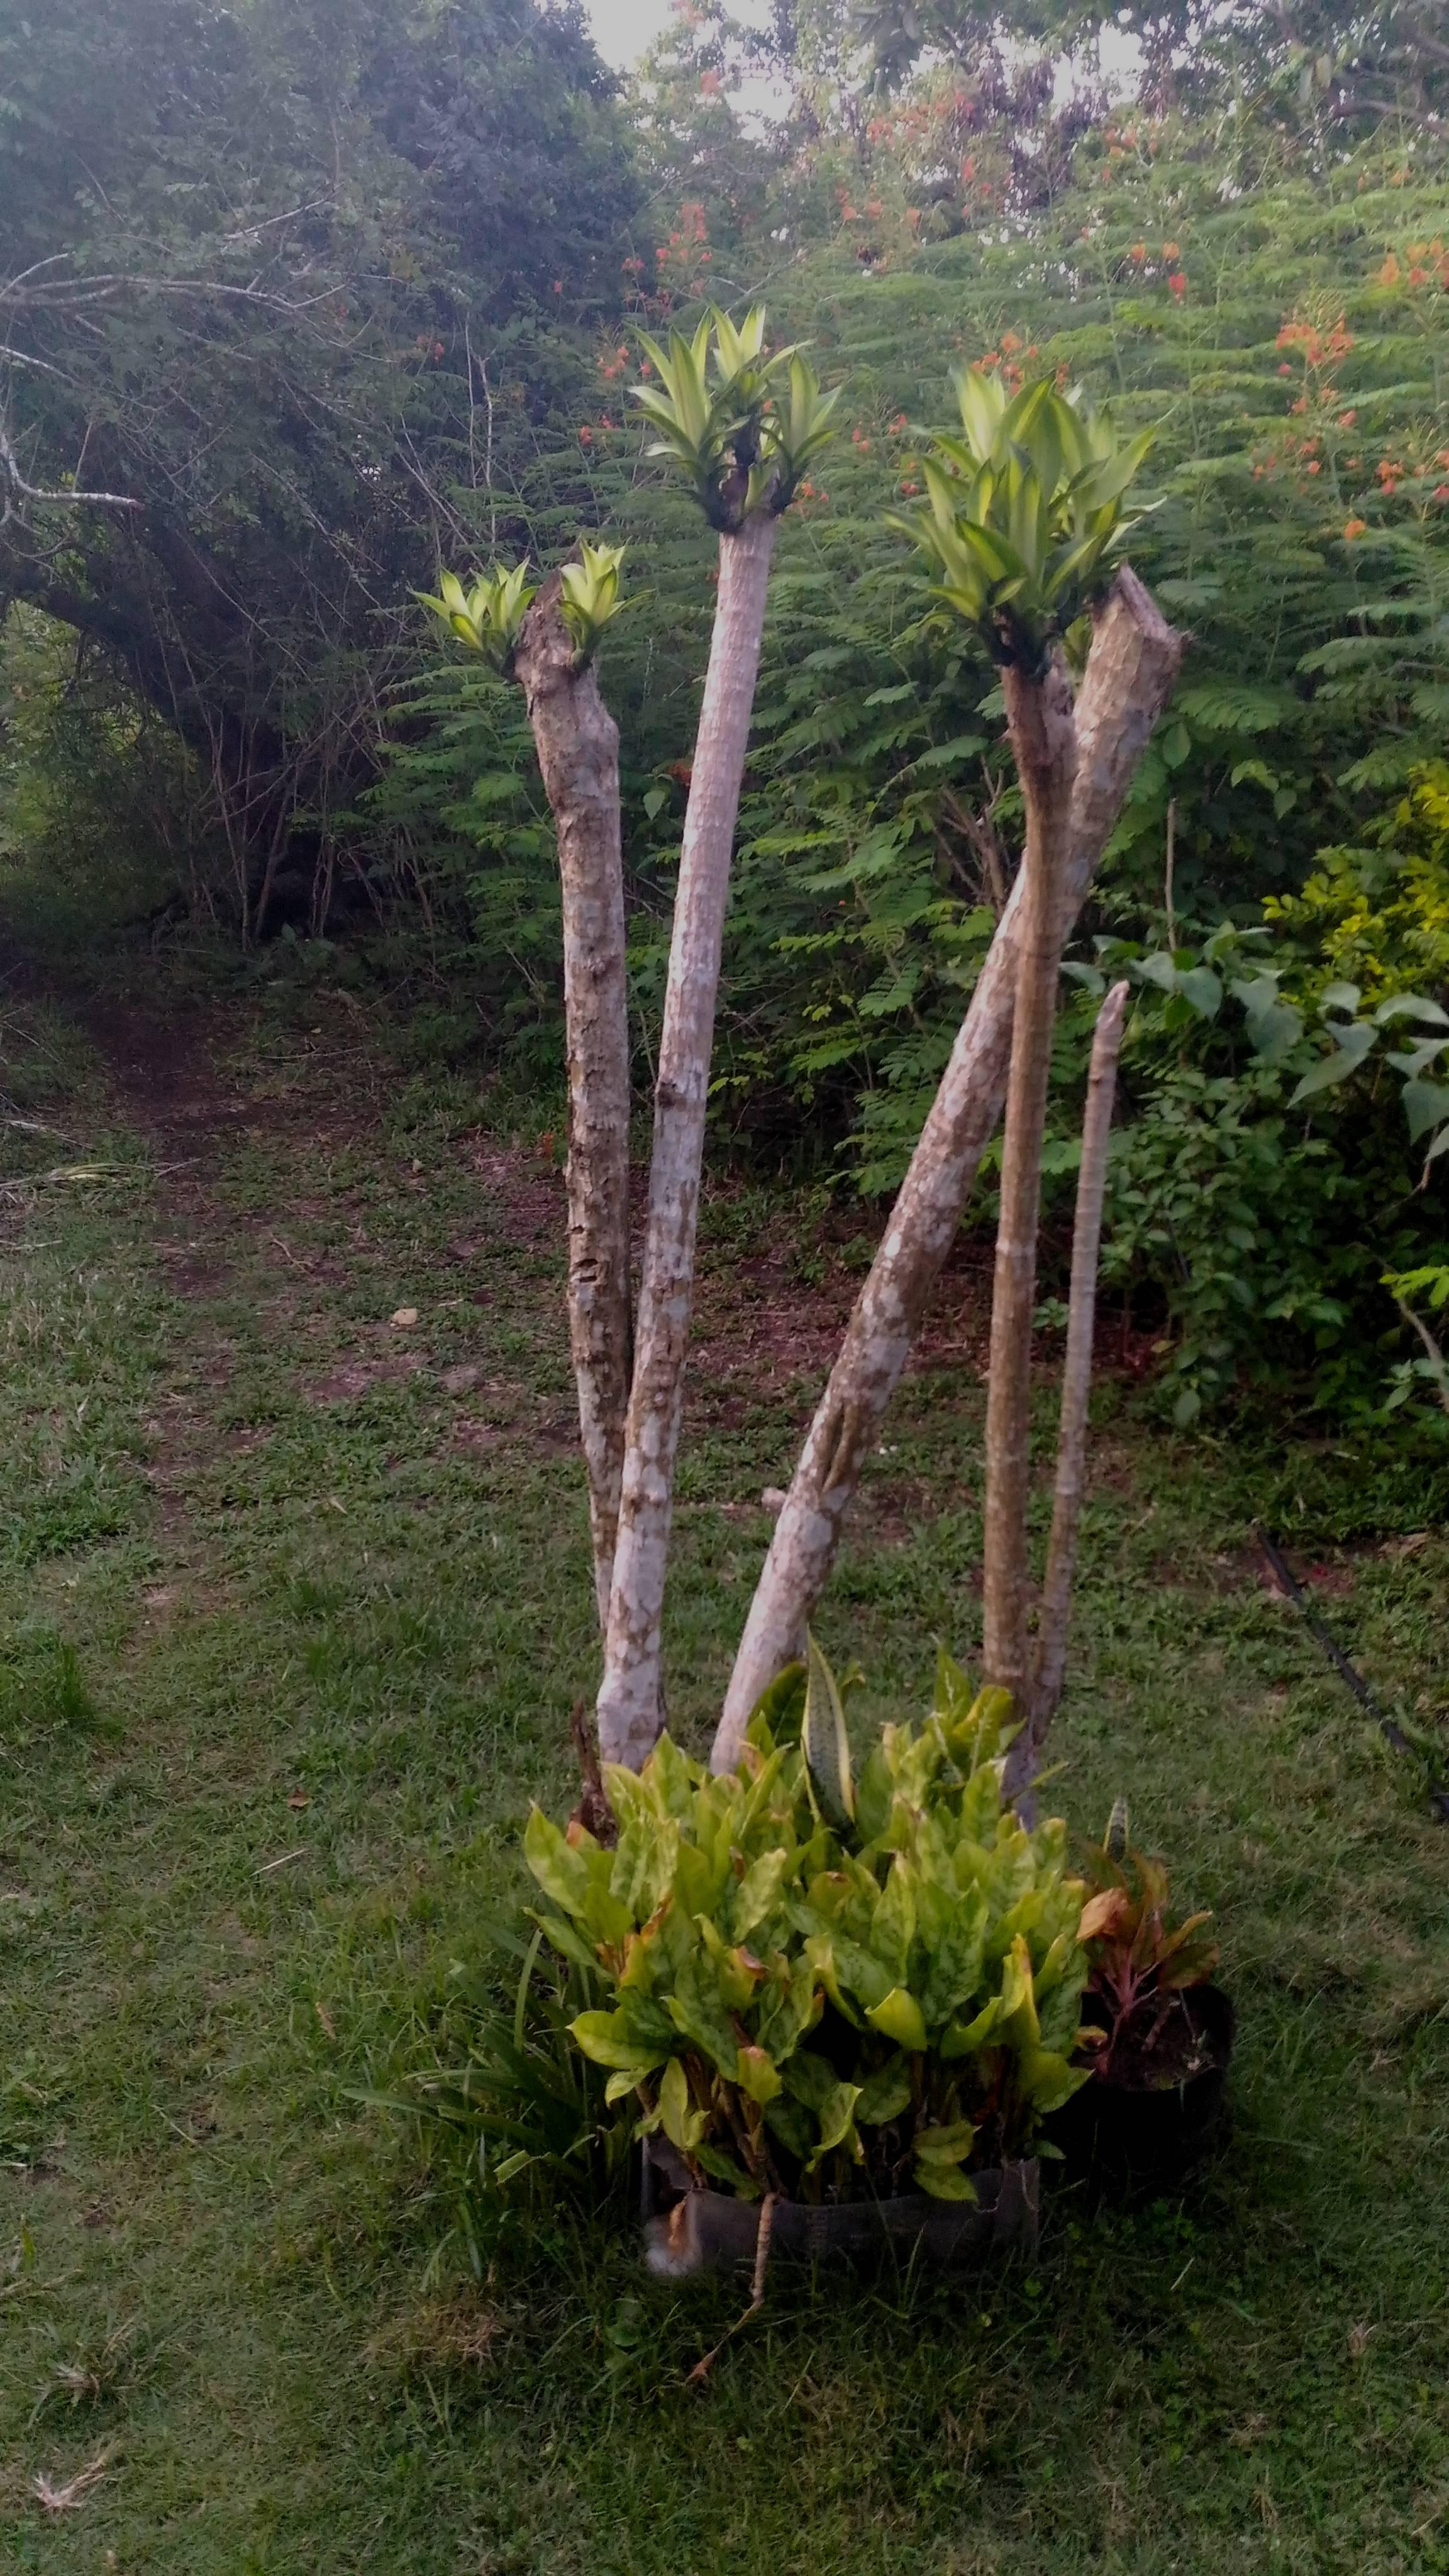 Beheaded corn stalk plant